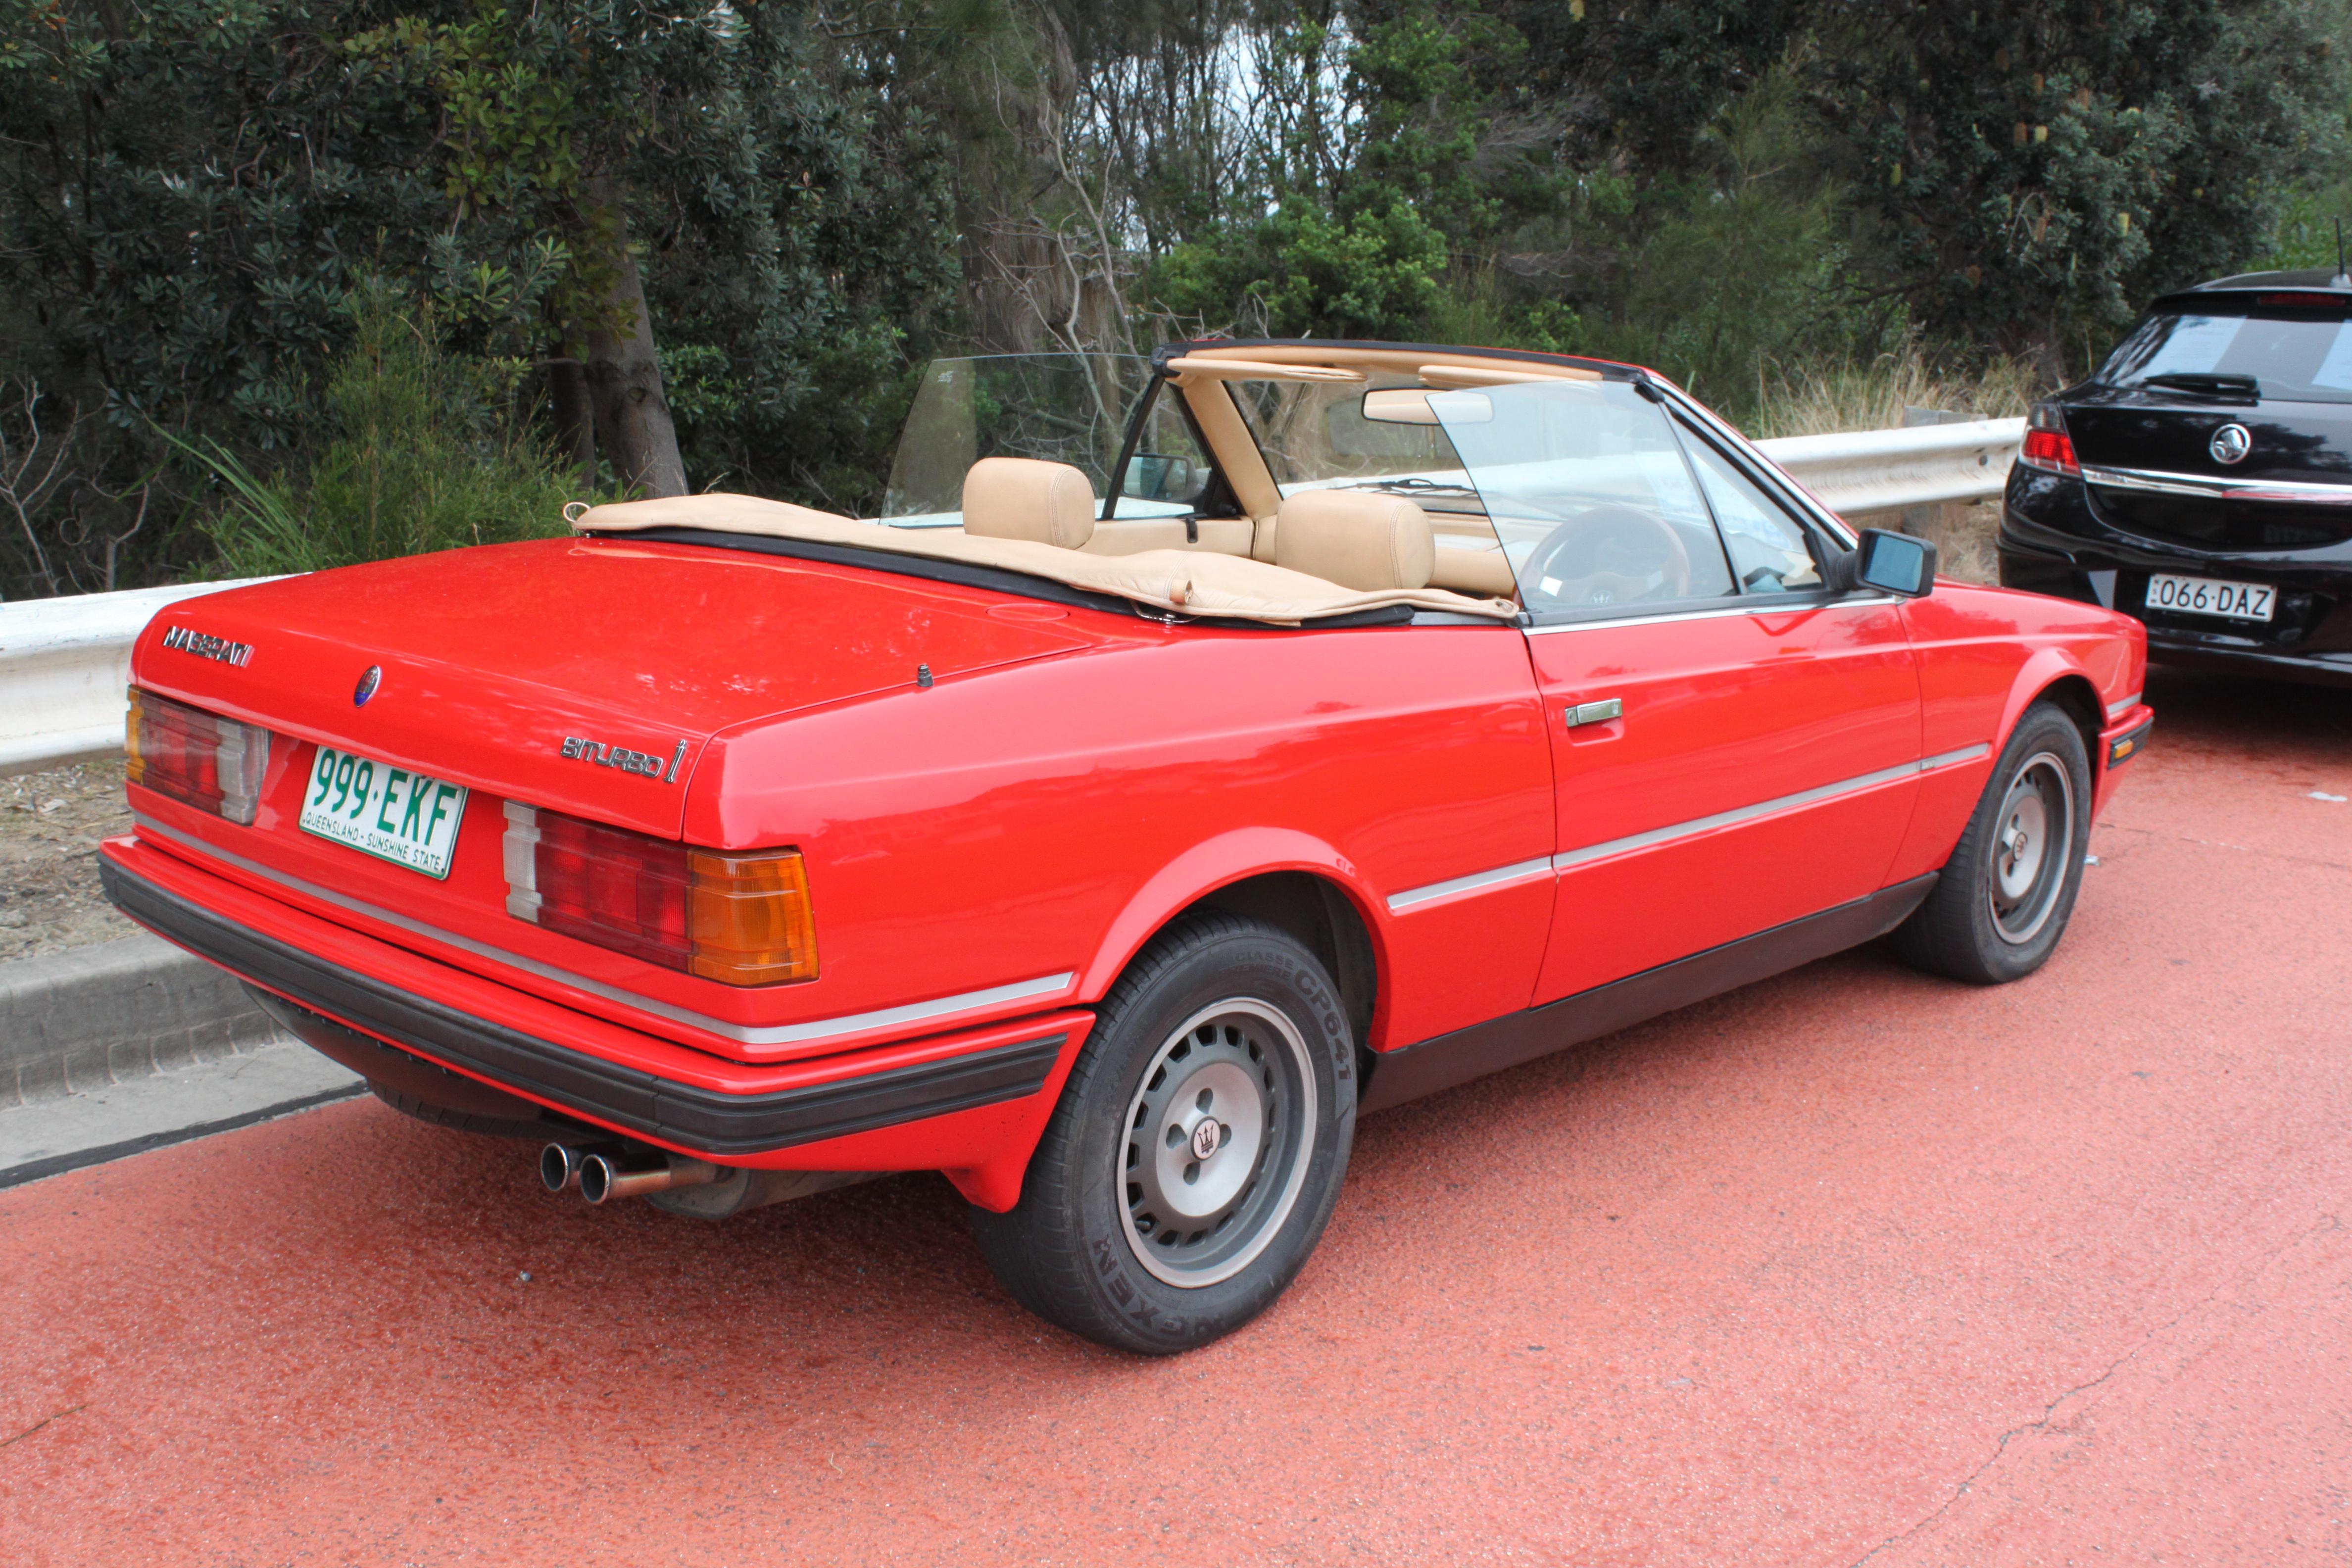 File:1989 Maserati Biturbo Spyder i convertible ...